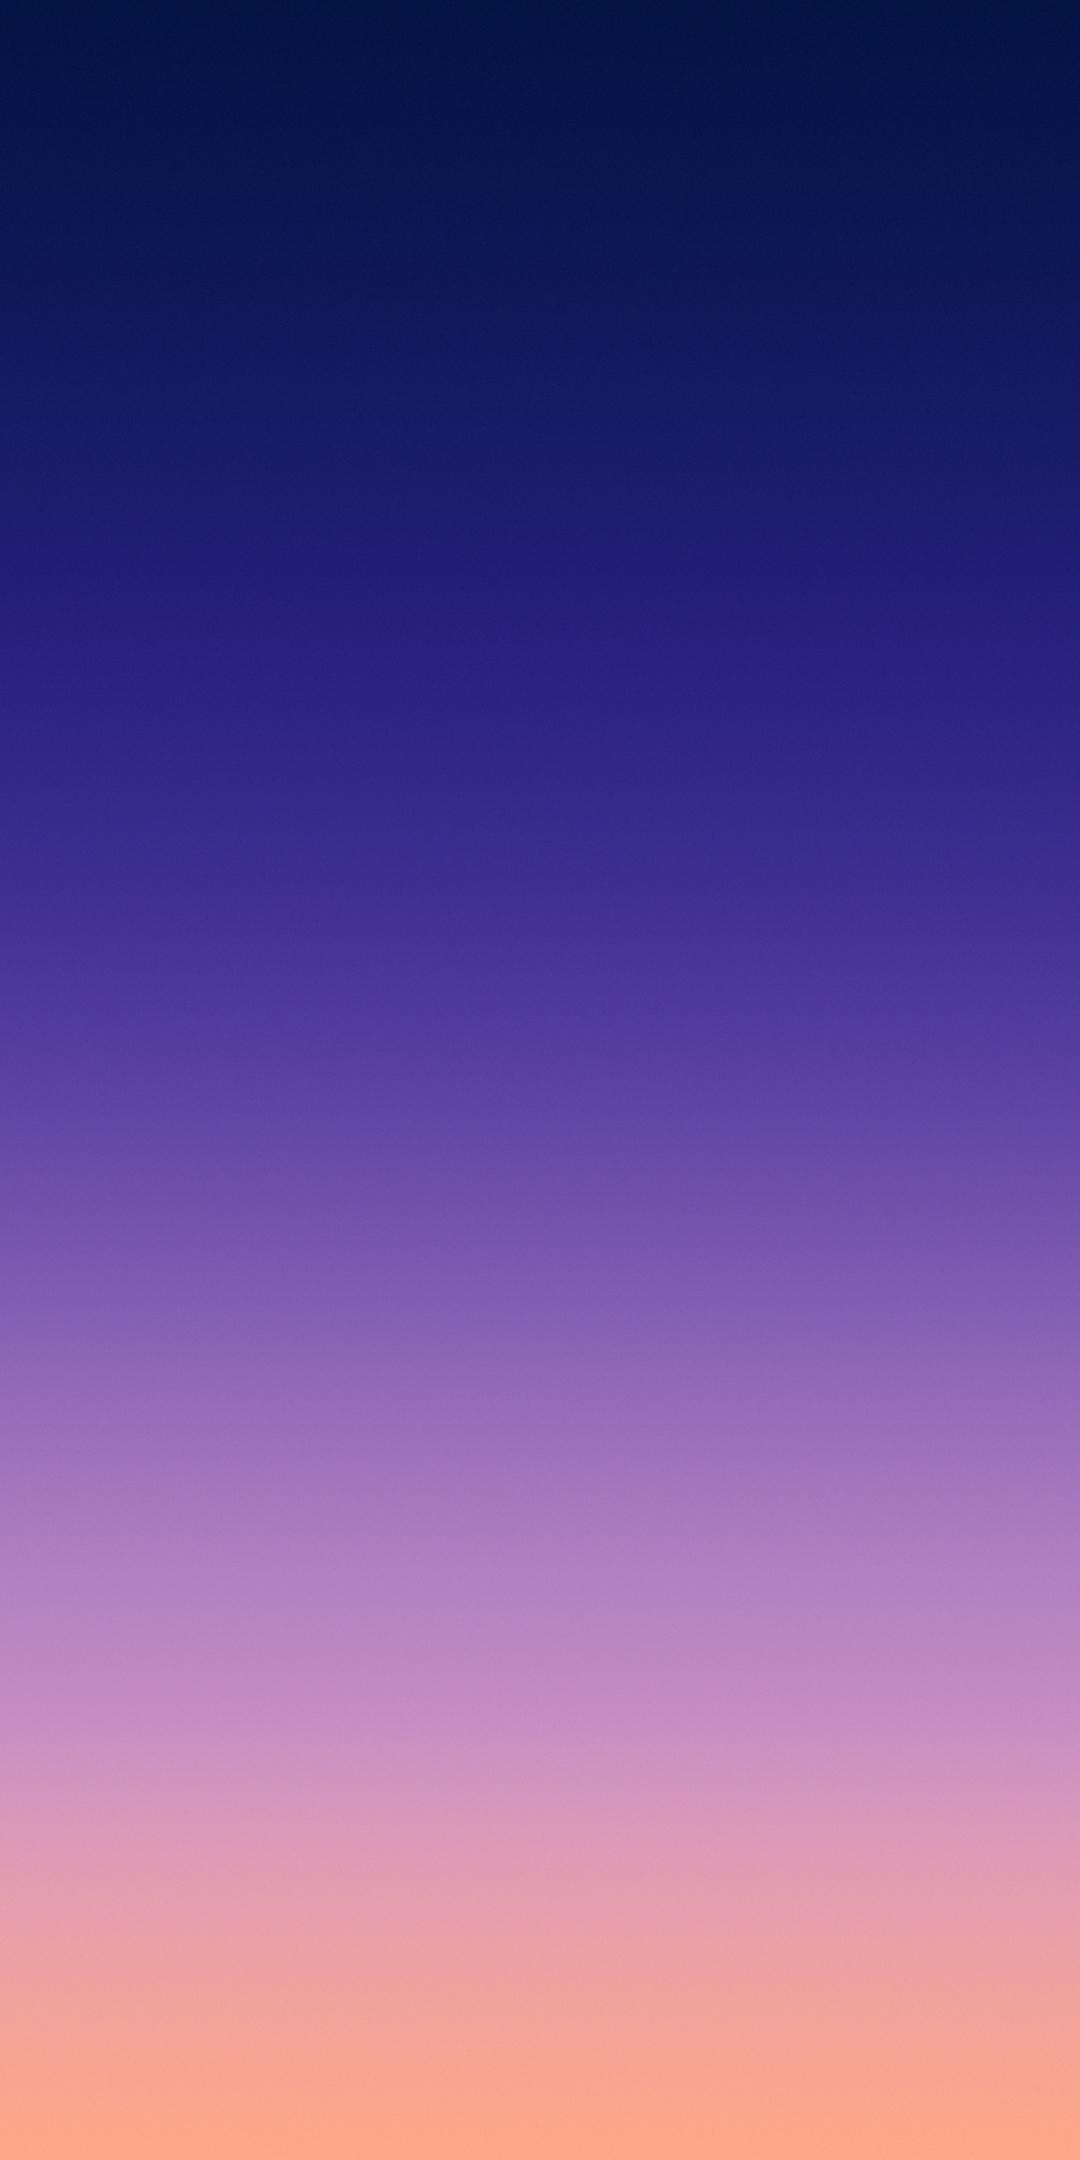 عکس زمینه اصلی شیائومی ردمی نوت 9 پرو مکس بنفش تیره پس زمینه